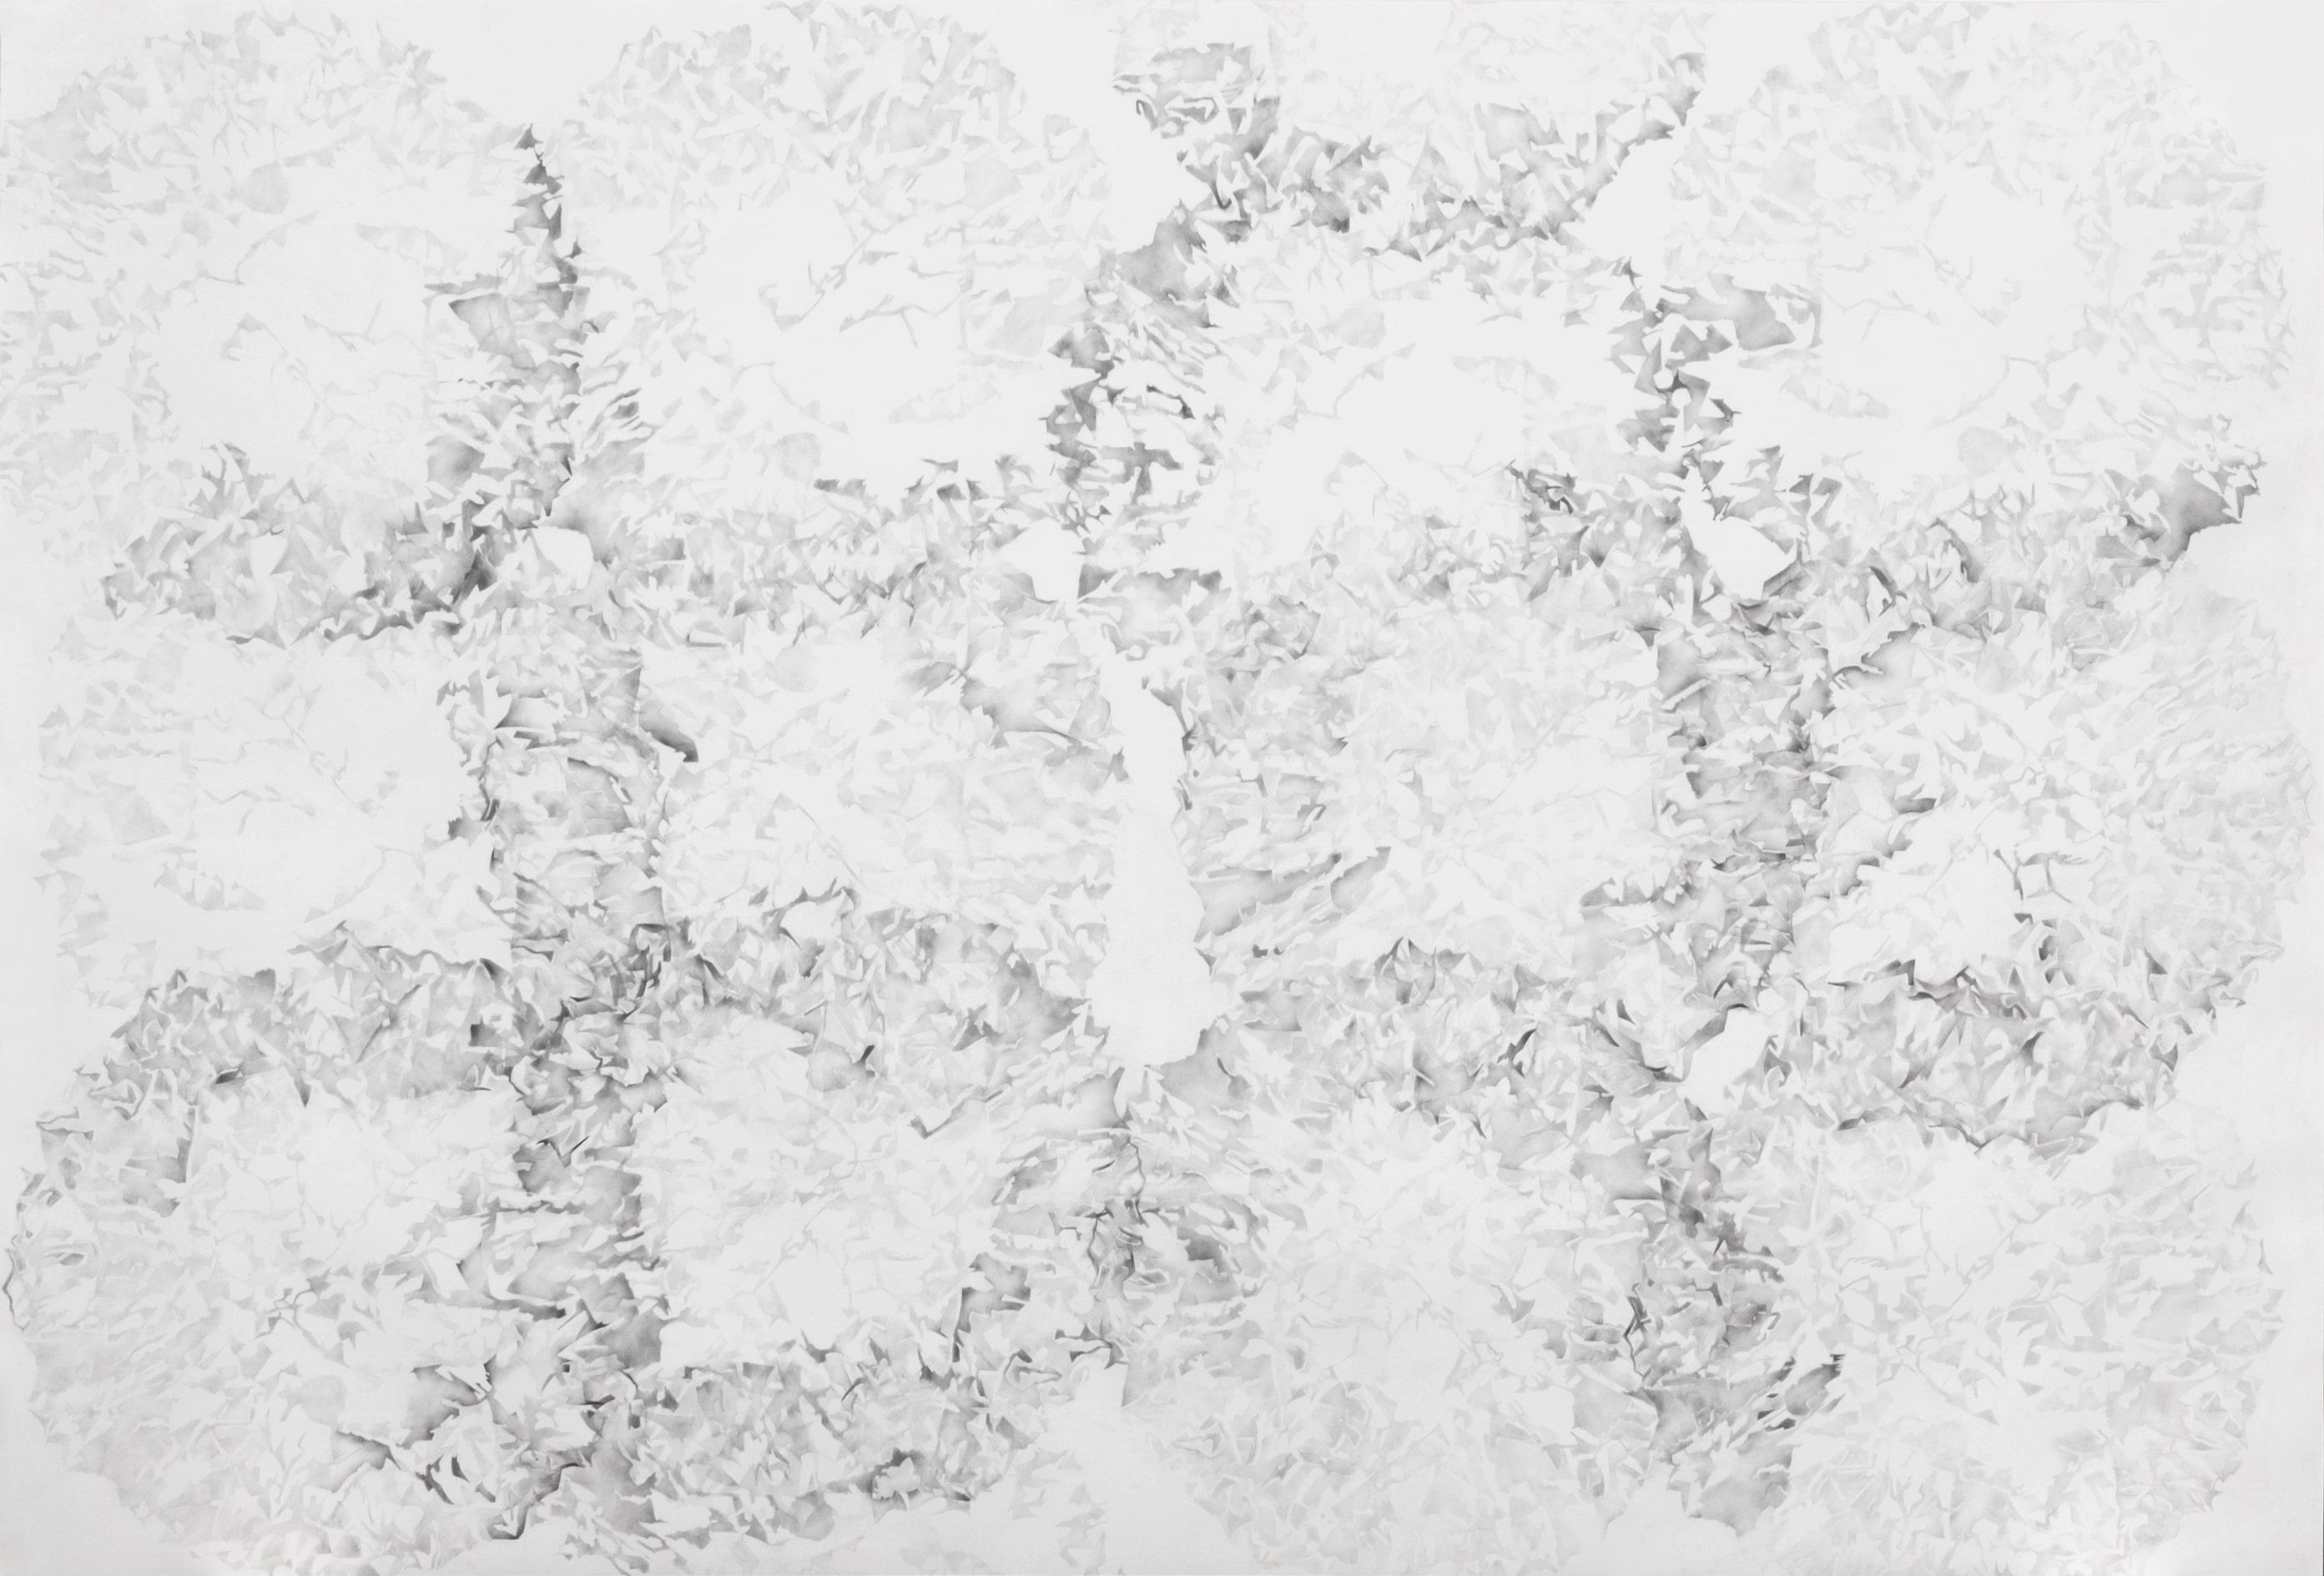 Art Atrium - Christopher Connell - Diamonds